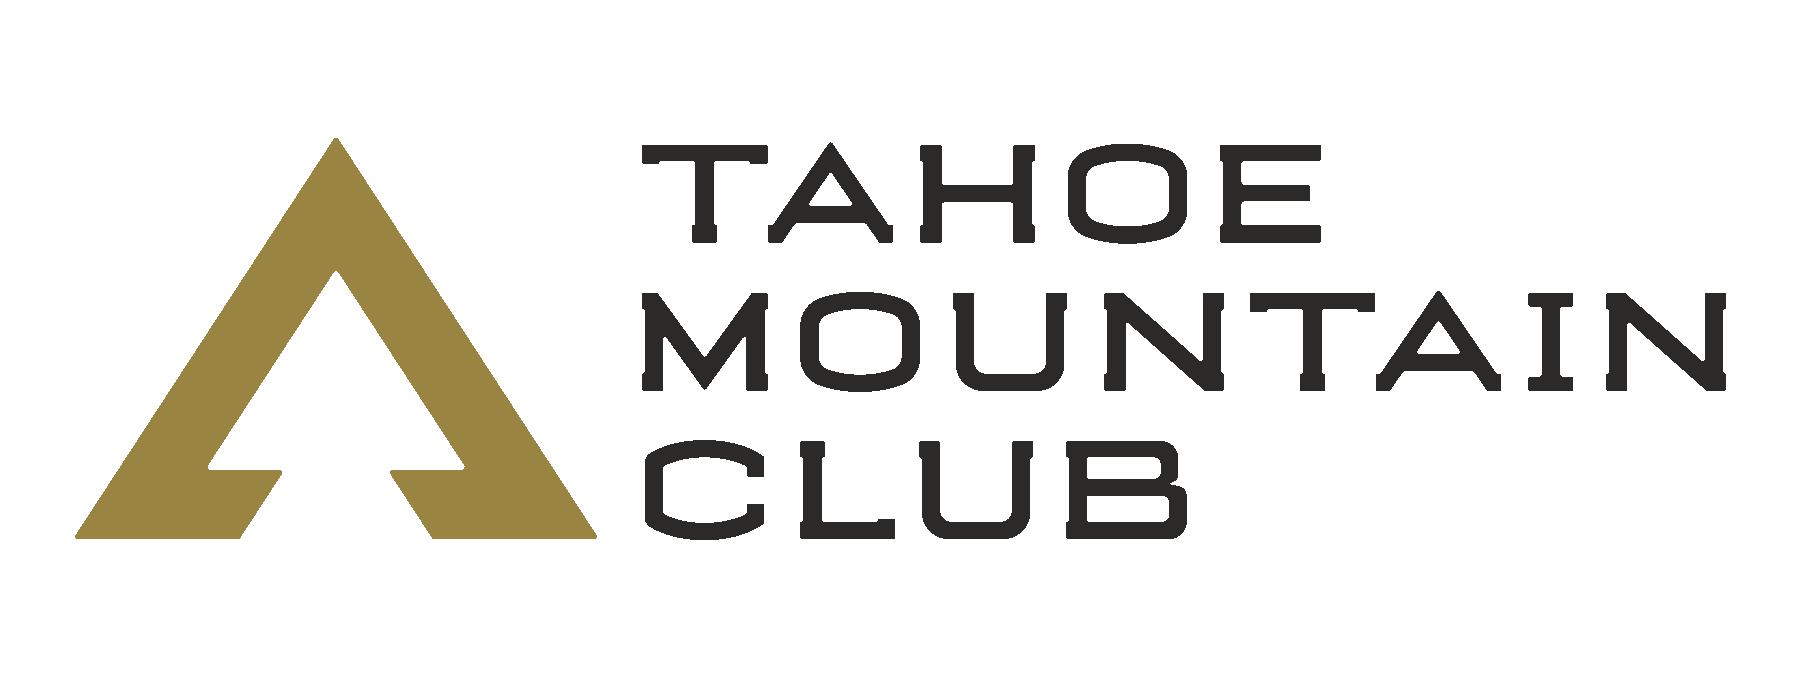 Tahoe Mountain Club